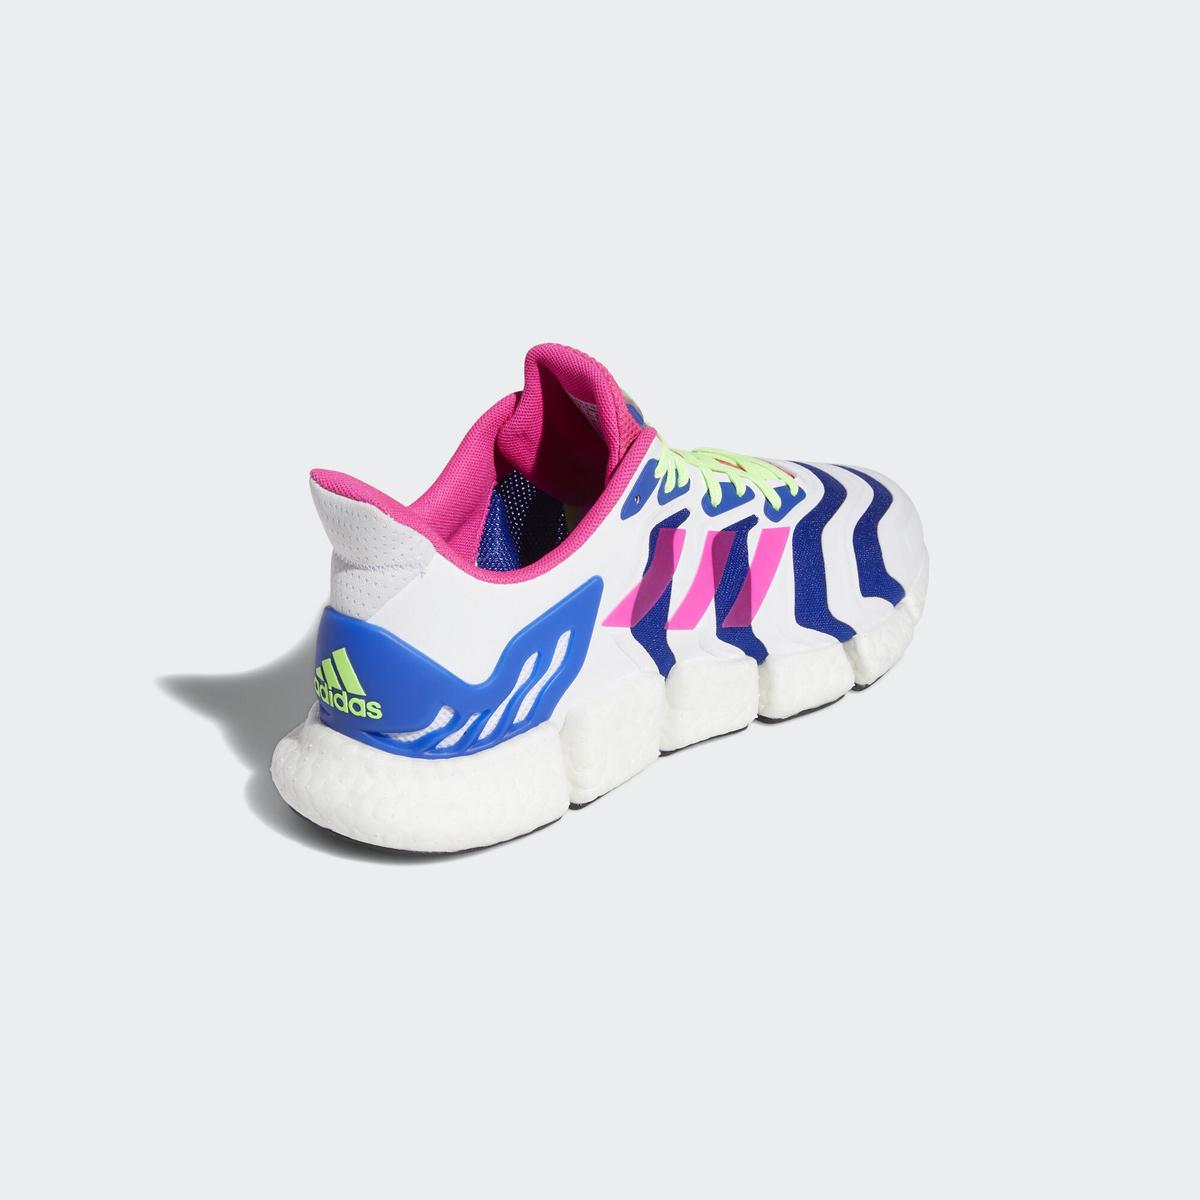 adidas,Climacool 清风跑鞋缓震升级!全新 adidas Climacool 搭载全掌 Boost!